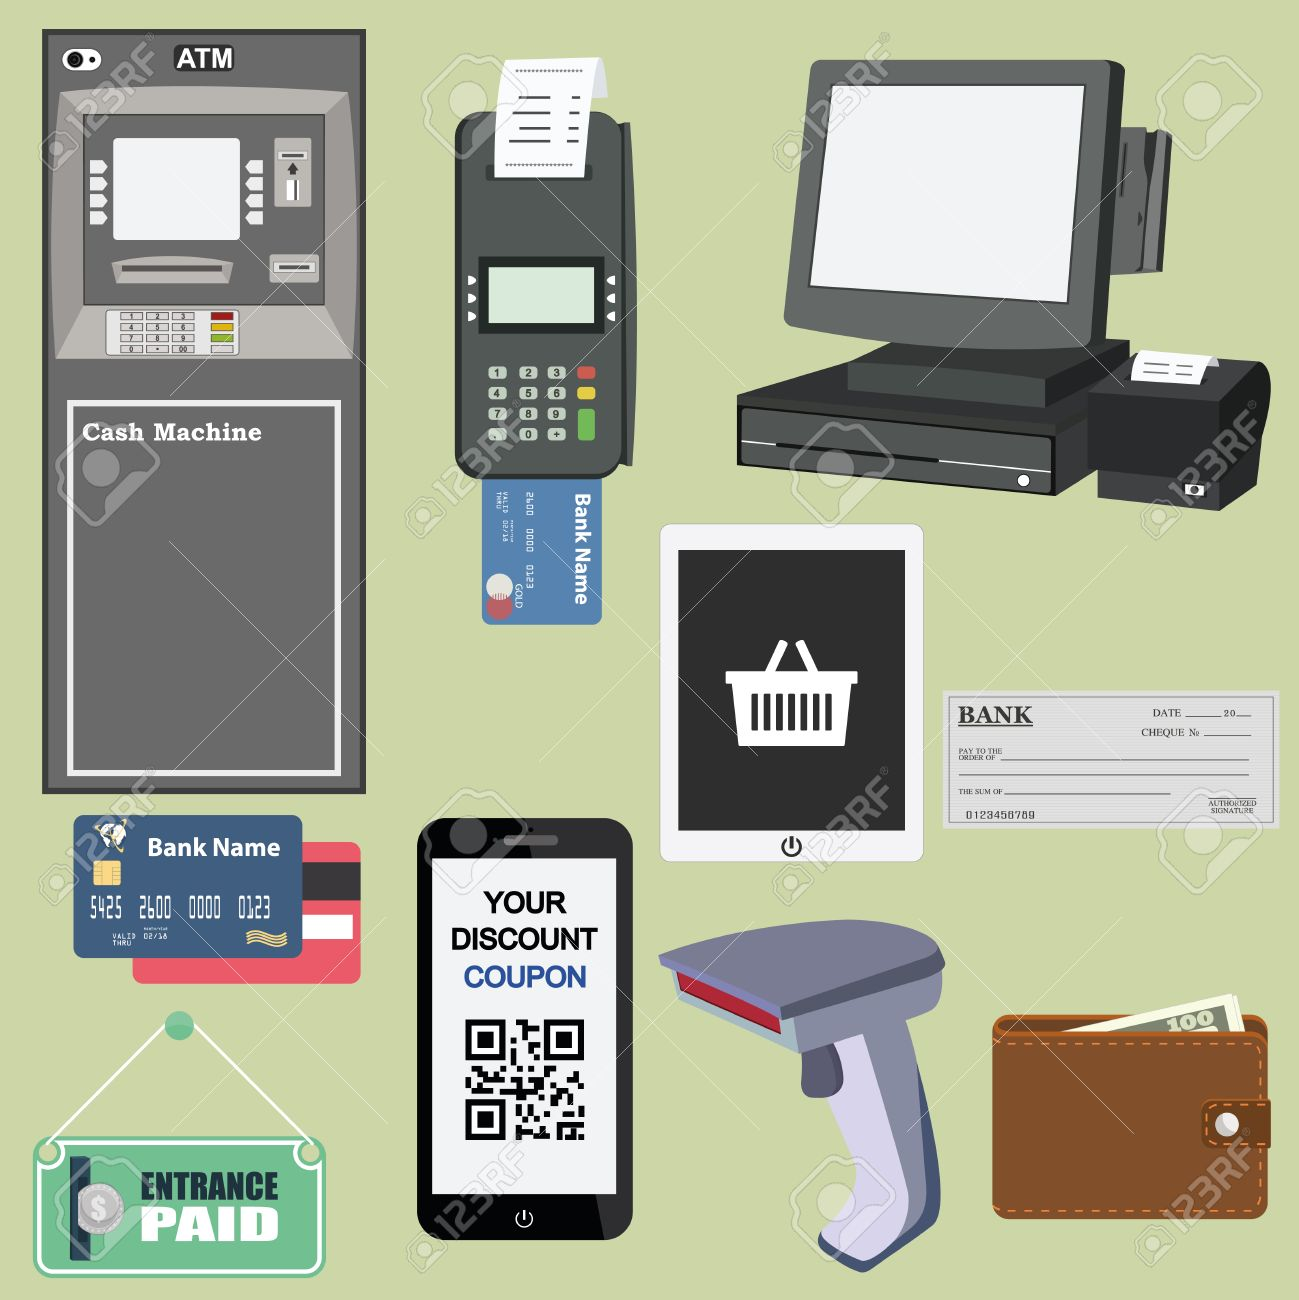 https://www.paynetsecure.net/wp-content/uploads/2019/04/Multi-Channel-Payment-Processing.jpg